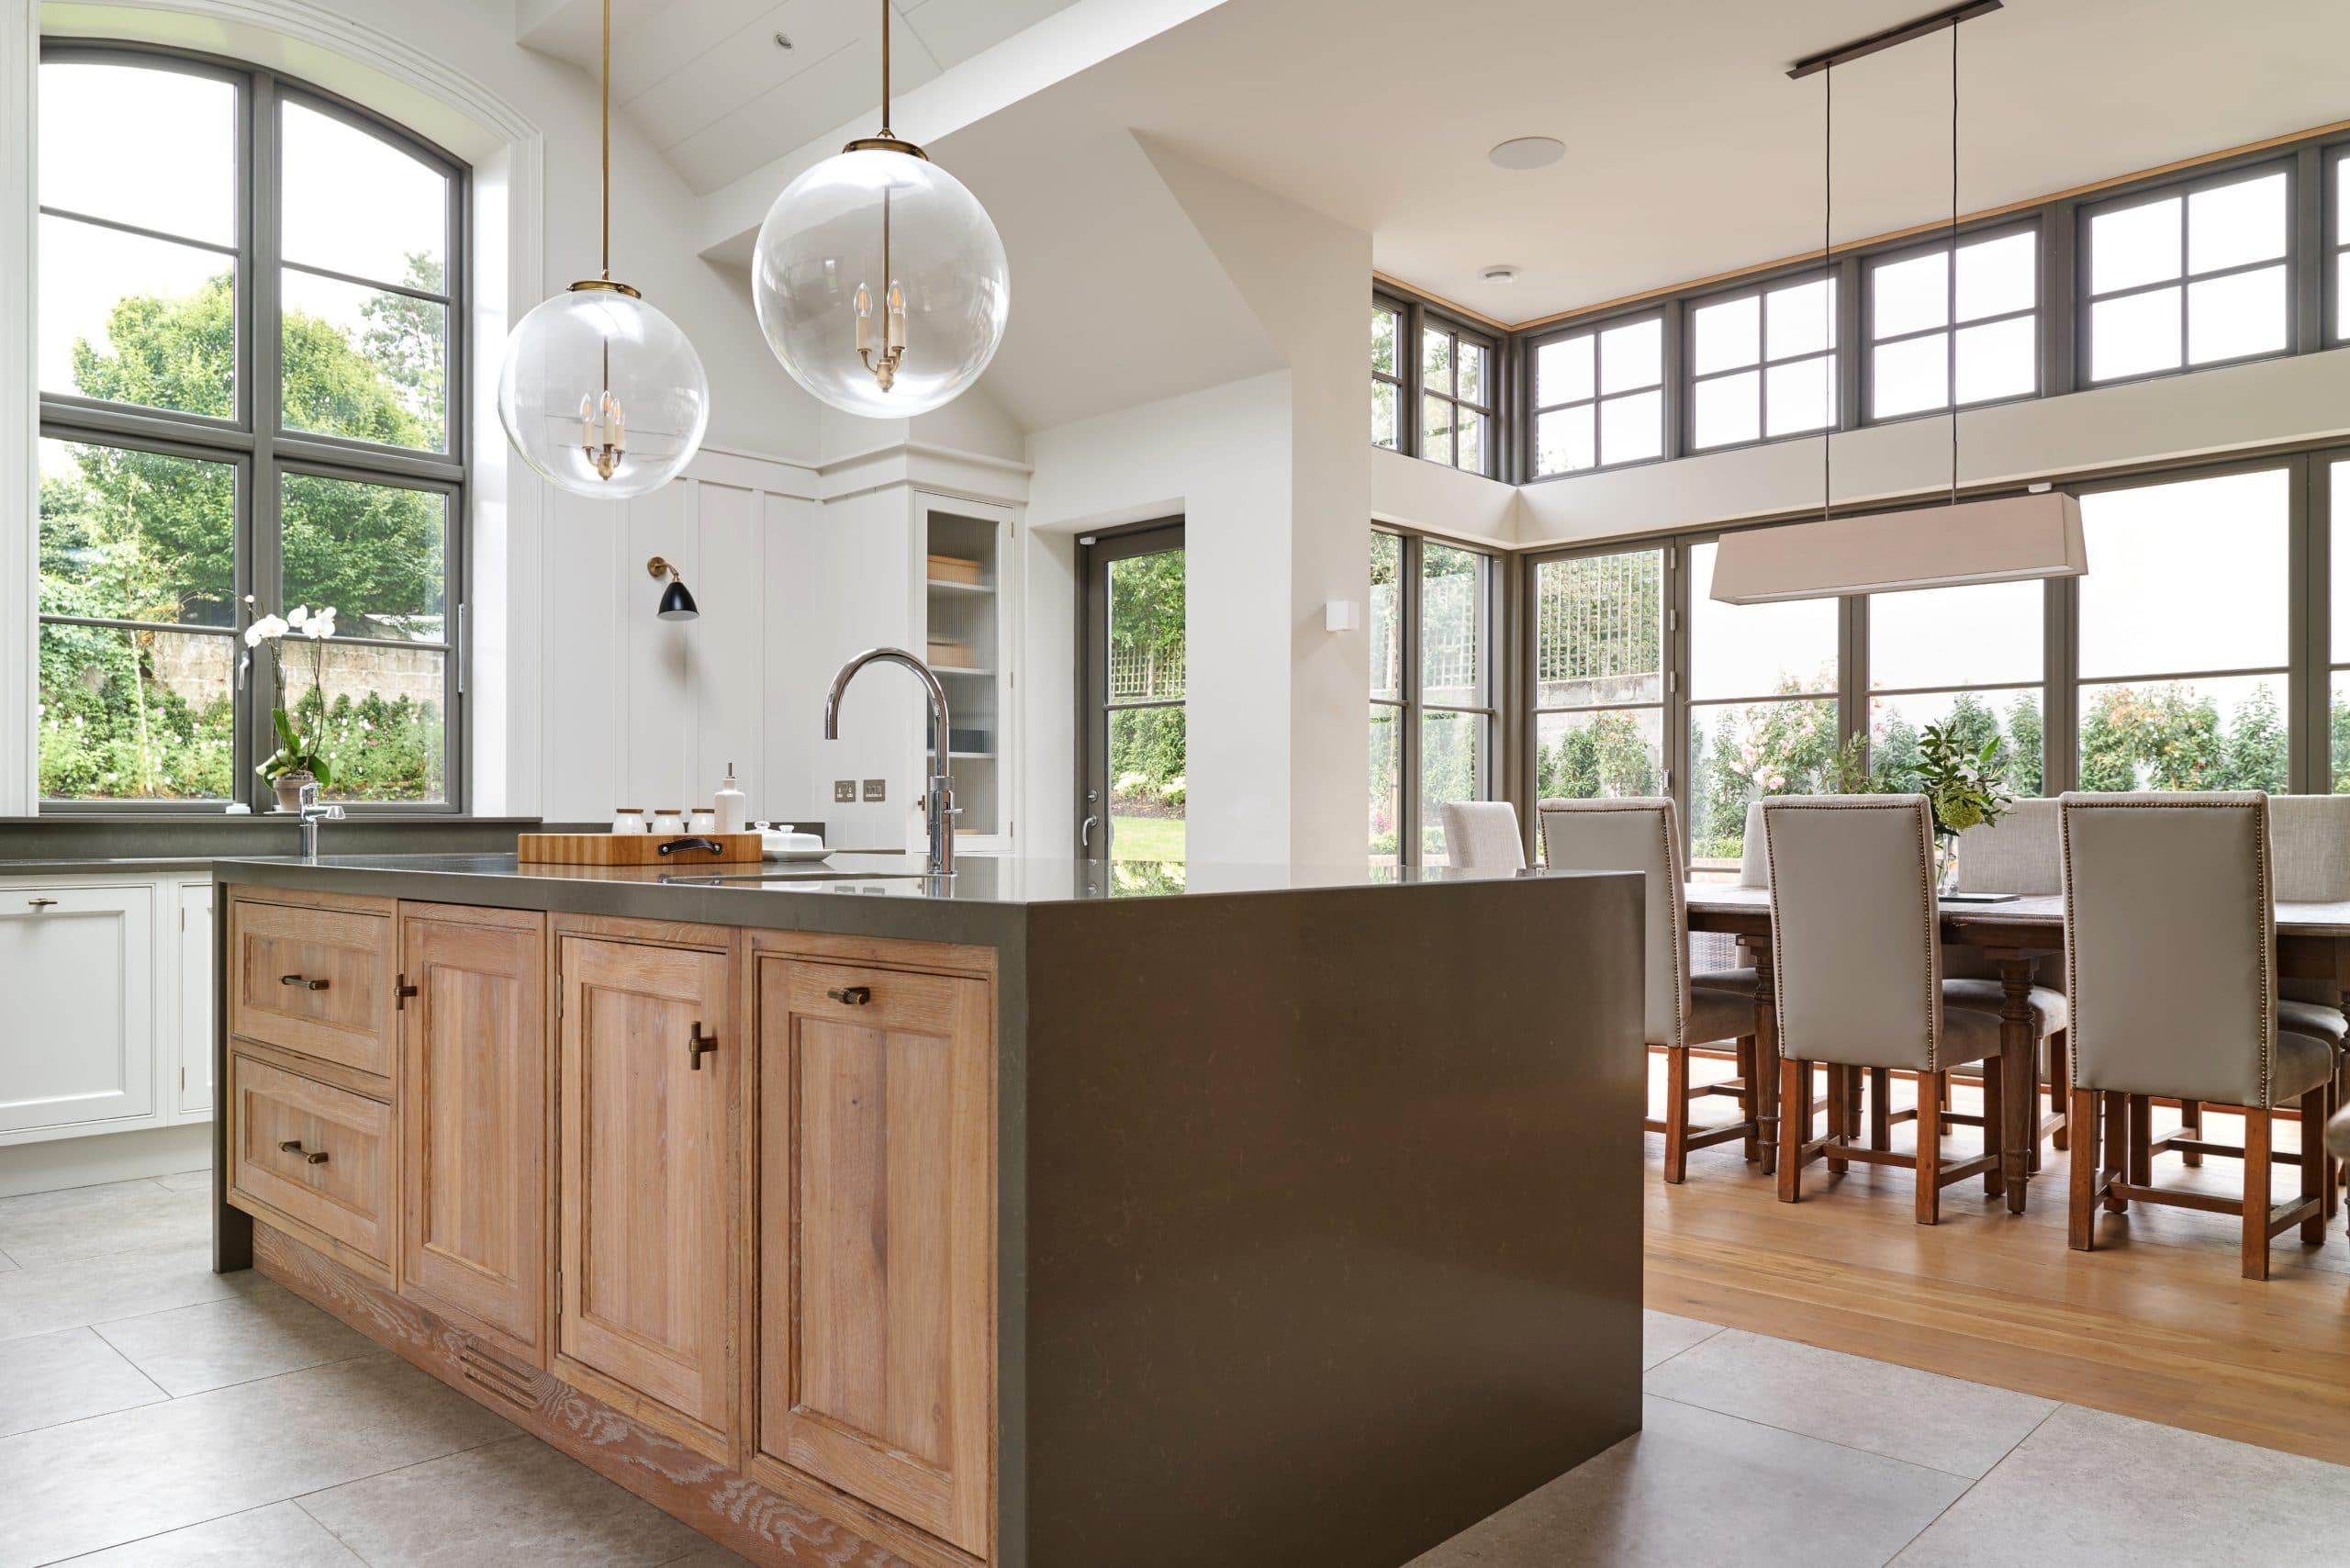 Windows and Doors in kitchen